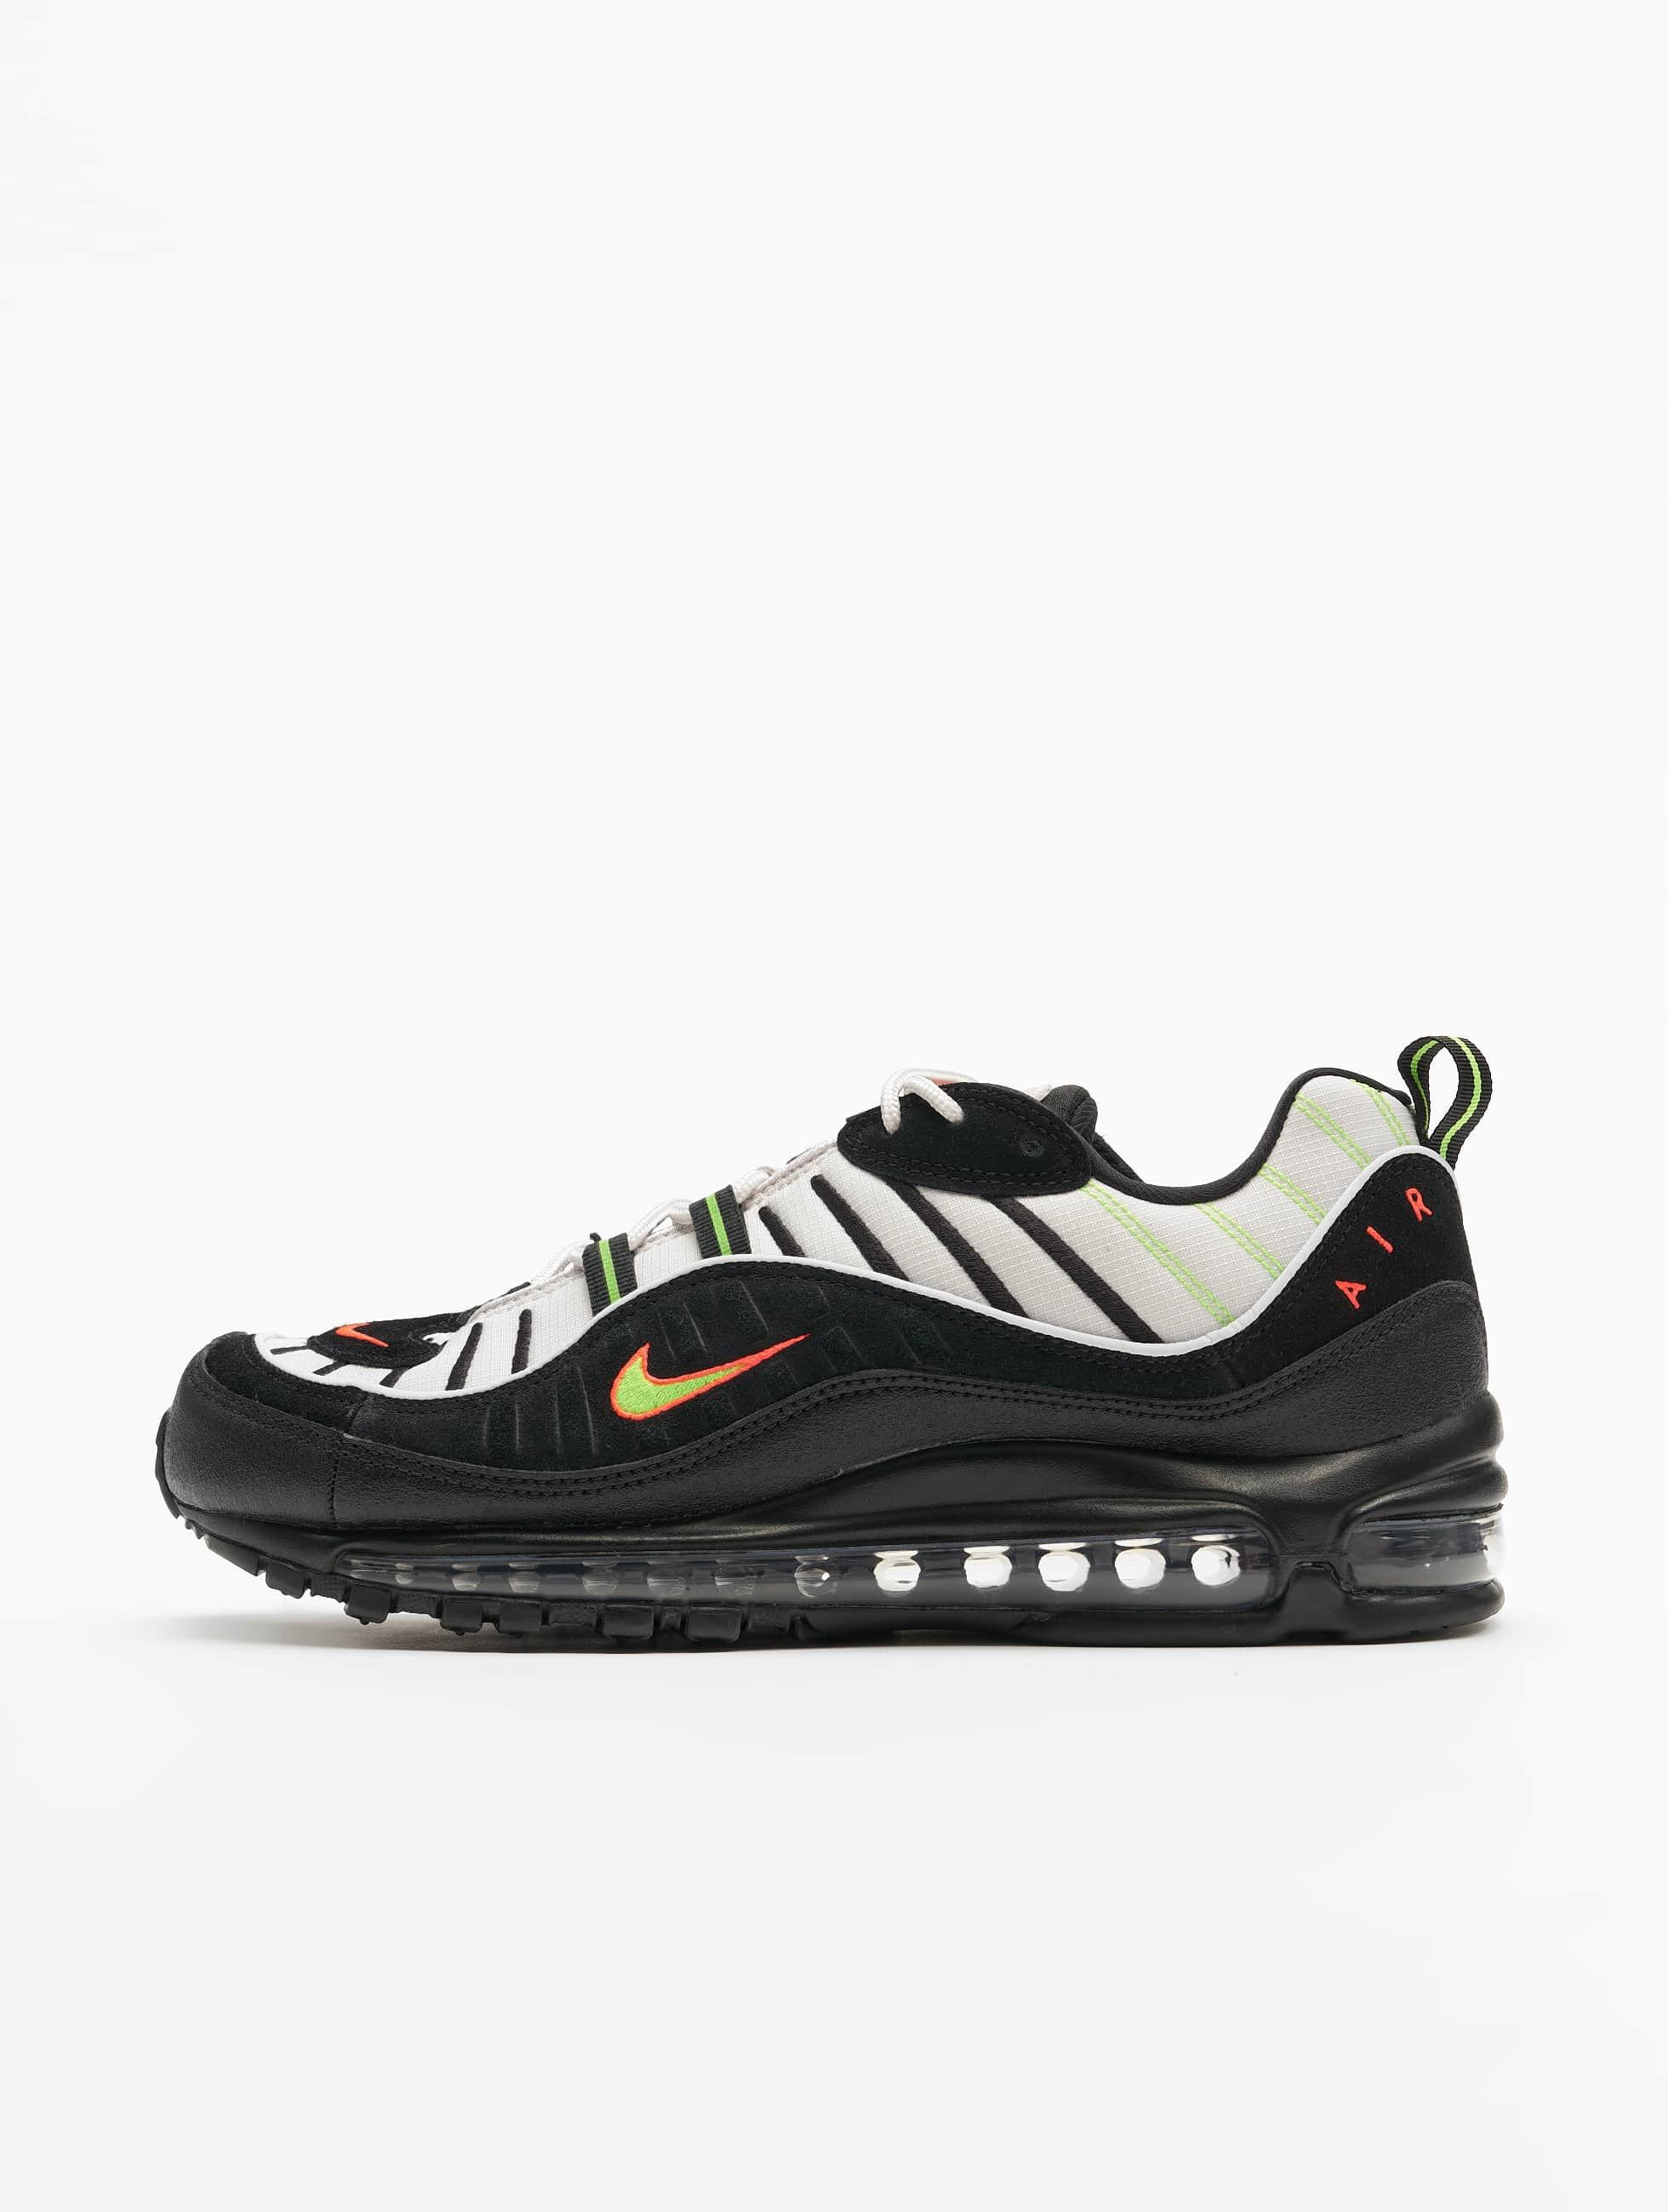 Nike Air Max 98 Sneakers Platinum TintBlackElectric Green